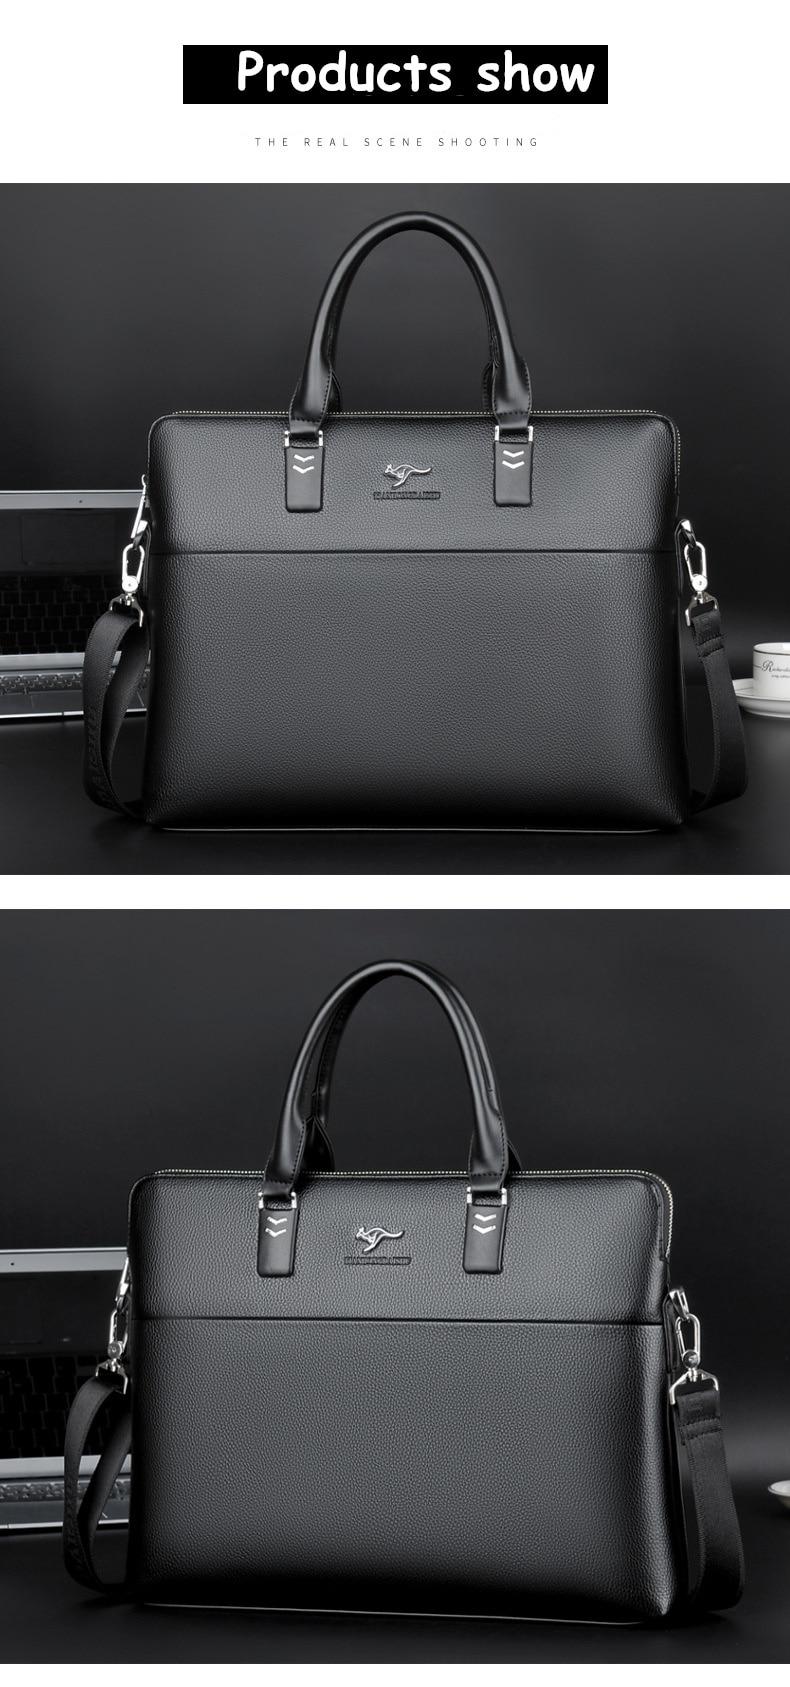 HTB1Rfa XfNNTKJjSspeq6ySwpXaC TIANHONGDAISHU Men Casual Briefcase Business Shoulder Leather Messenger Bags Computer Laptop Handbag Men's Travel Bags handbags